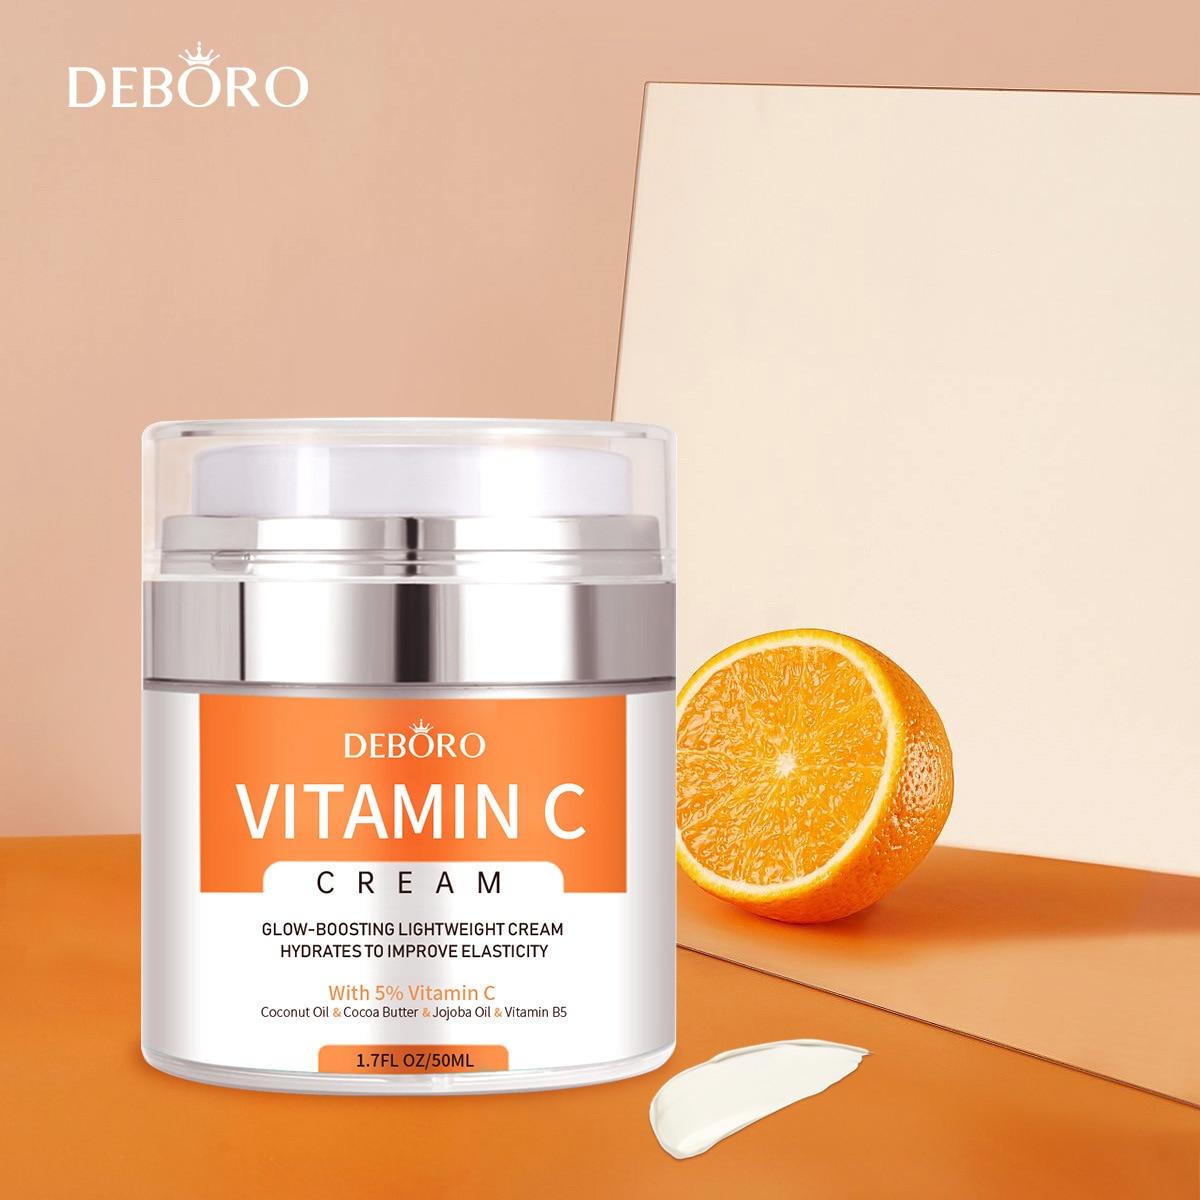 Vitamin C Cream vitamin C cream, VC cream wholesale moisturizing cream skincare Makeup Cosmetics